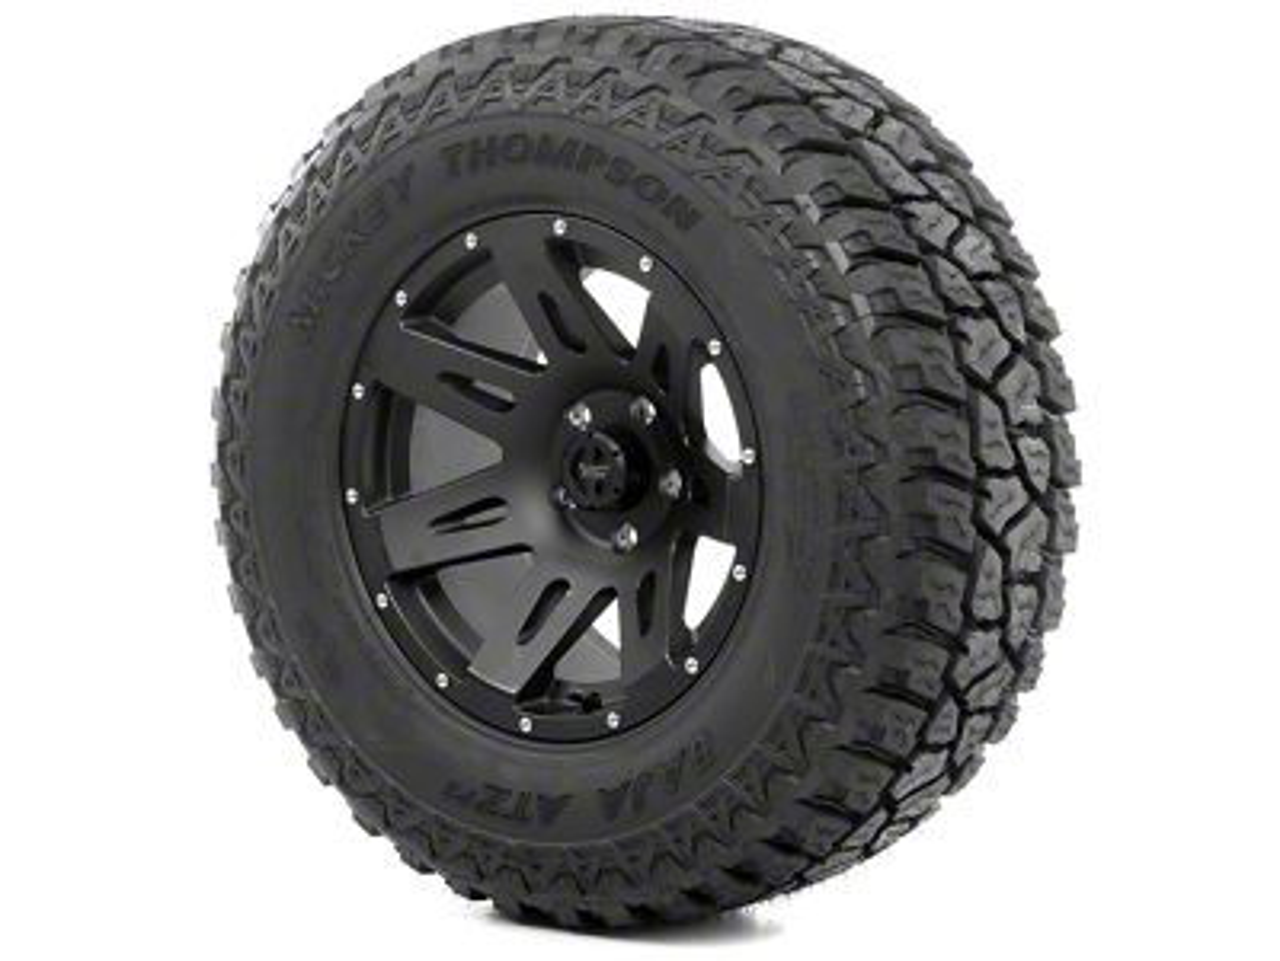 Rugged Ridge XHD Wheel 18x9 Black Satin and Mickey Thompson ATZ P3 305/60R18 Wheel - Tire Kit (07-18 Jeep Wrangler JK)